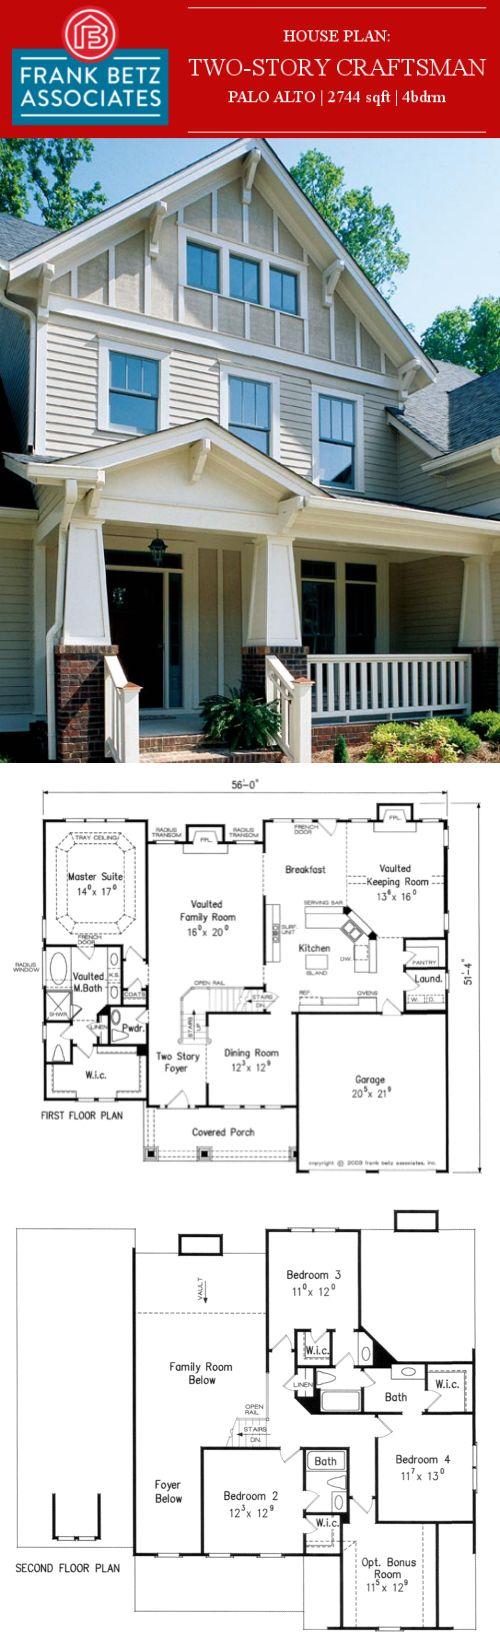 craftsman two story frank betz plan the palo alto has house plan 16862wg cozy 3 bedroom cottage w bonus room